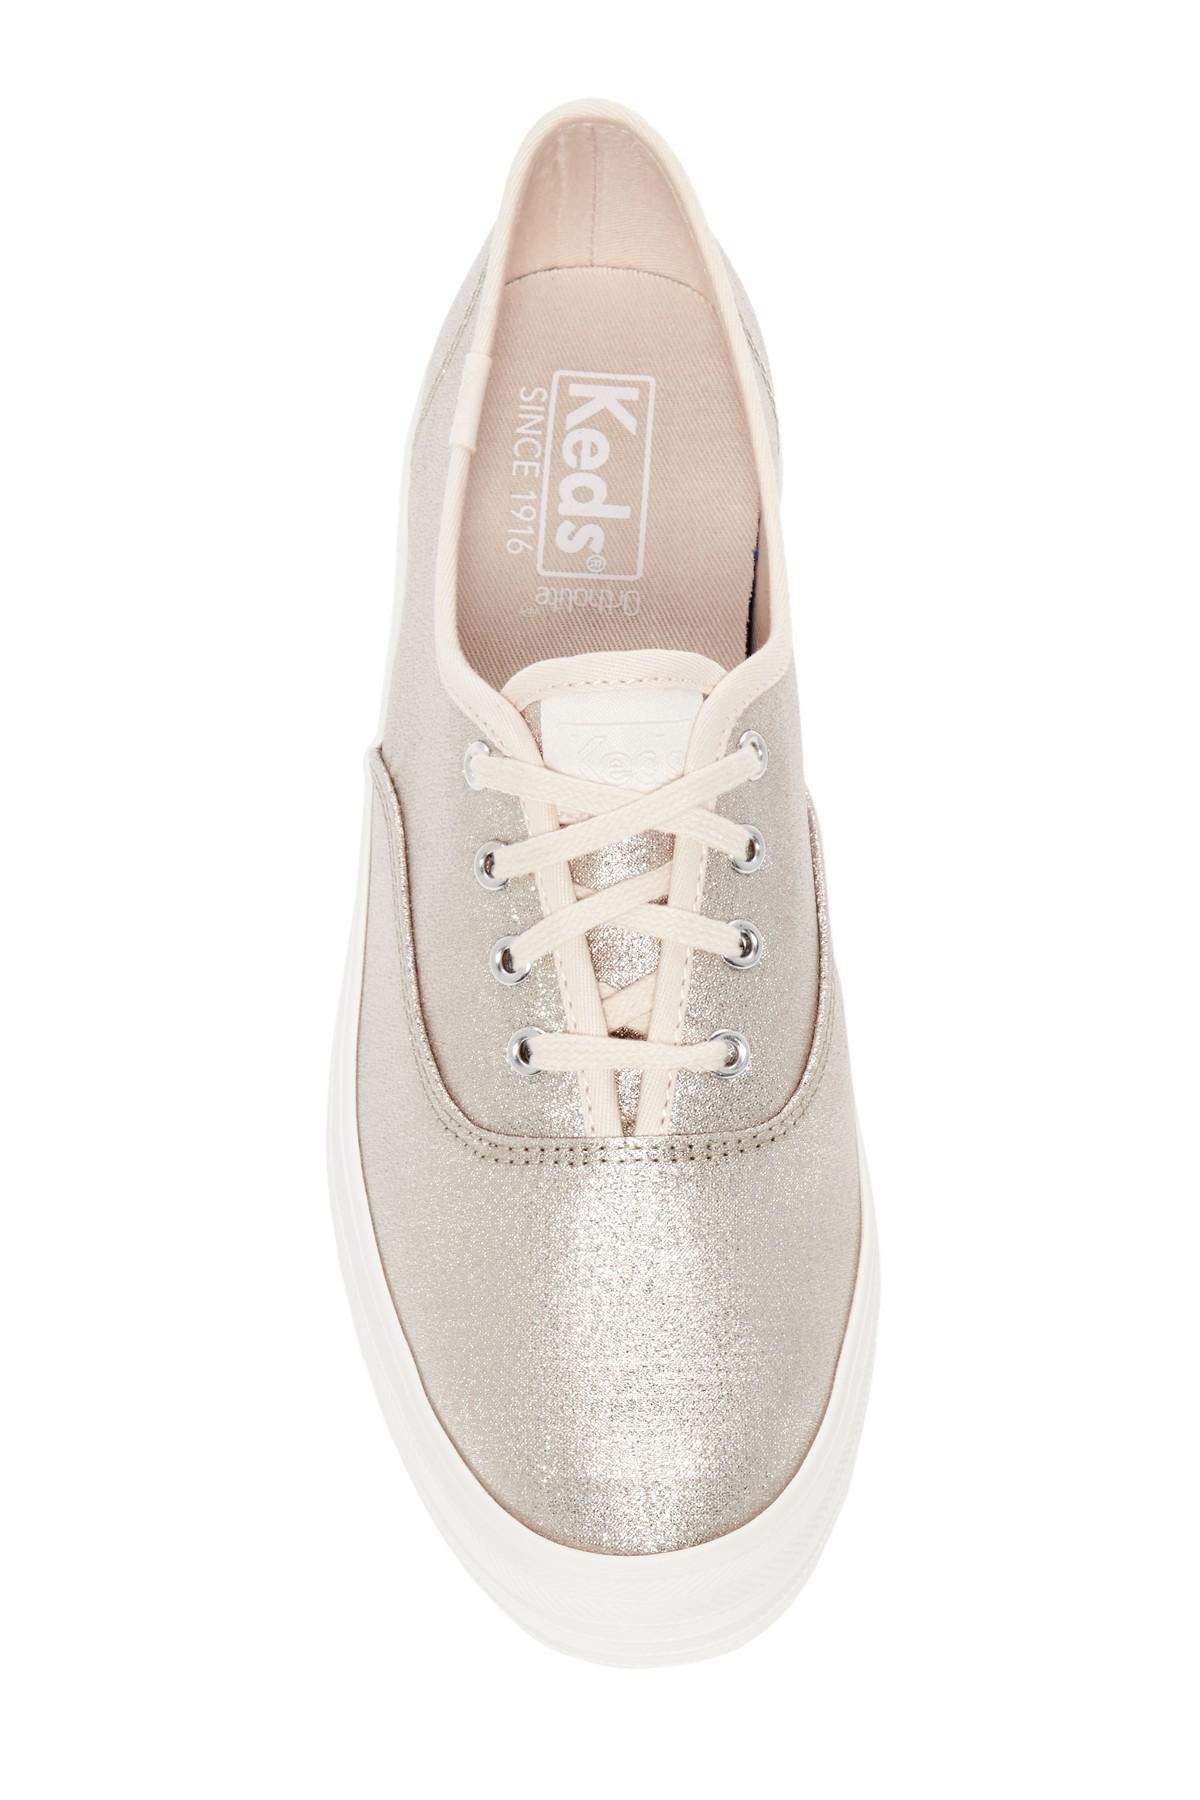 0f320789d71e0 Lyst - Keds Triple Lurex Platform Sneaker